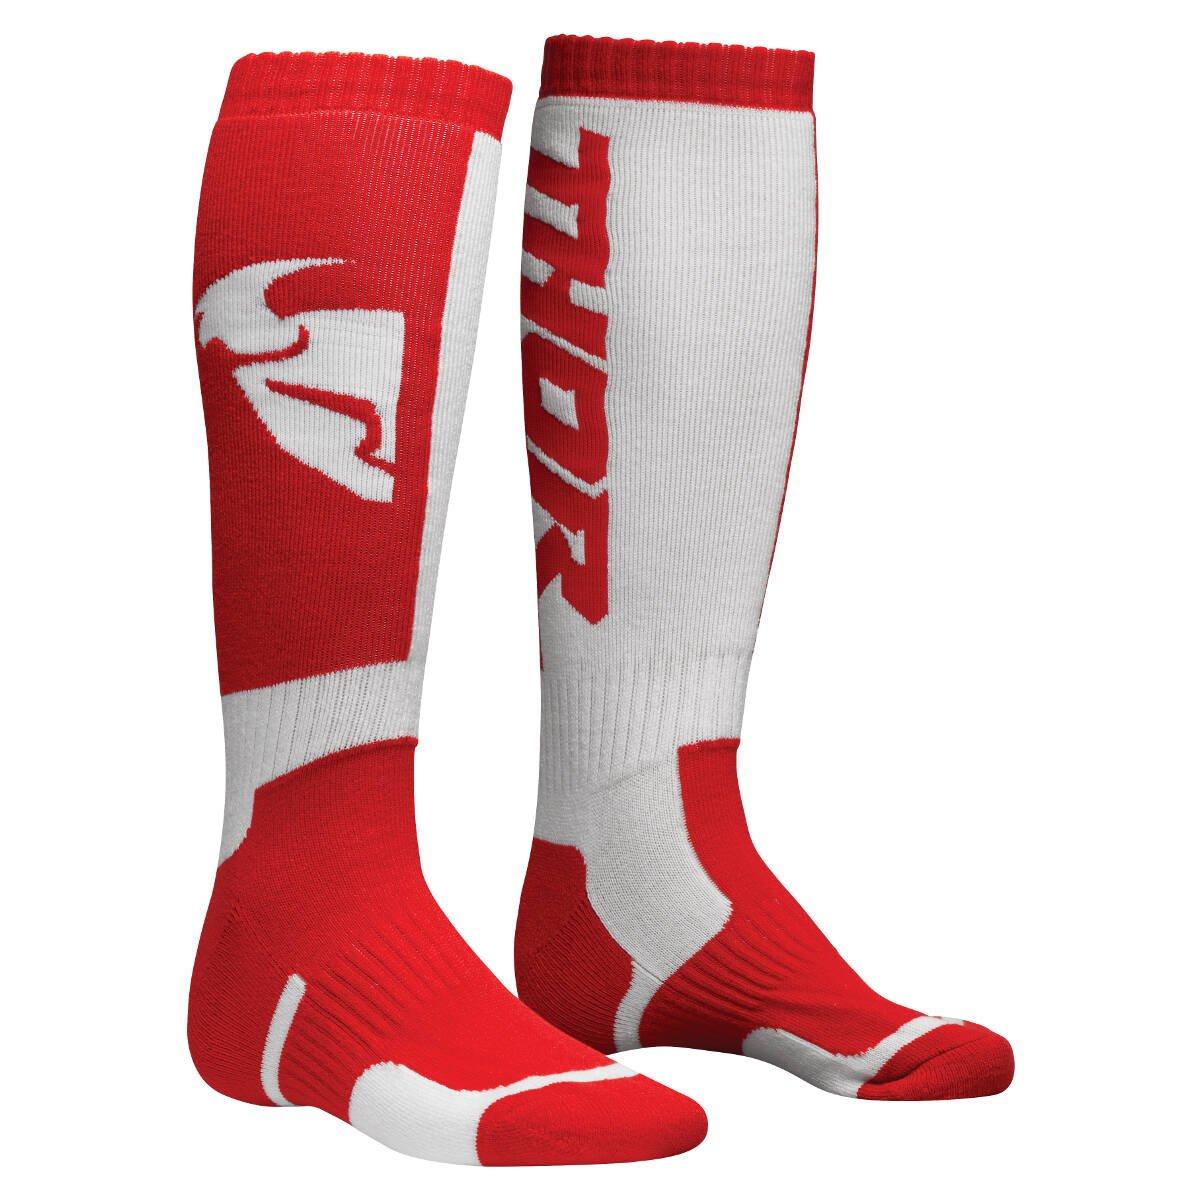 Thor Socken MX Rot/Weiß